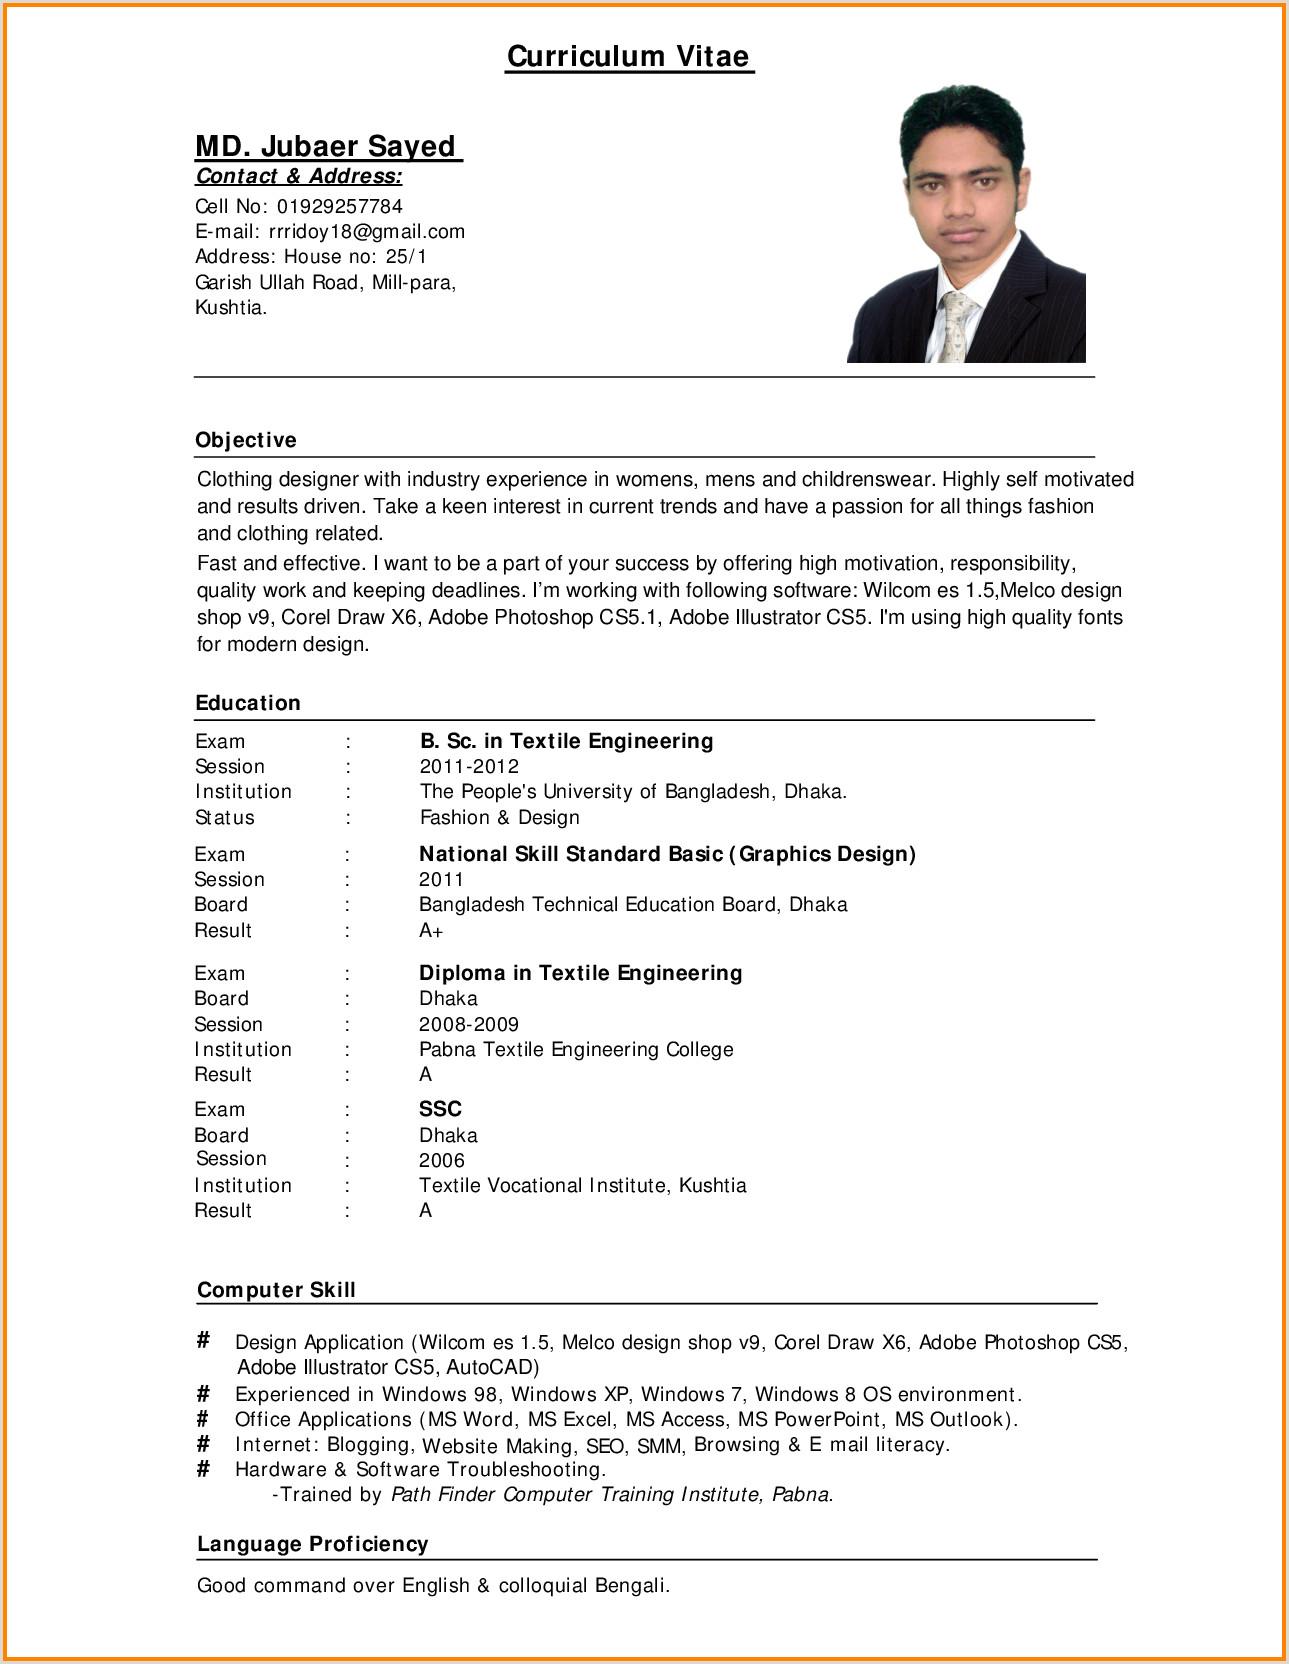 Standard Cv format for Experienced Standard Cv format Bangladesh Professional Resumes Sample